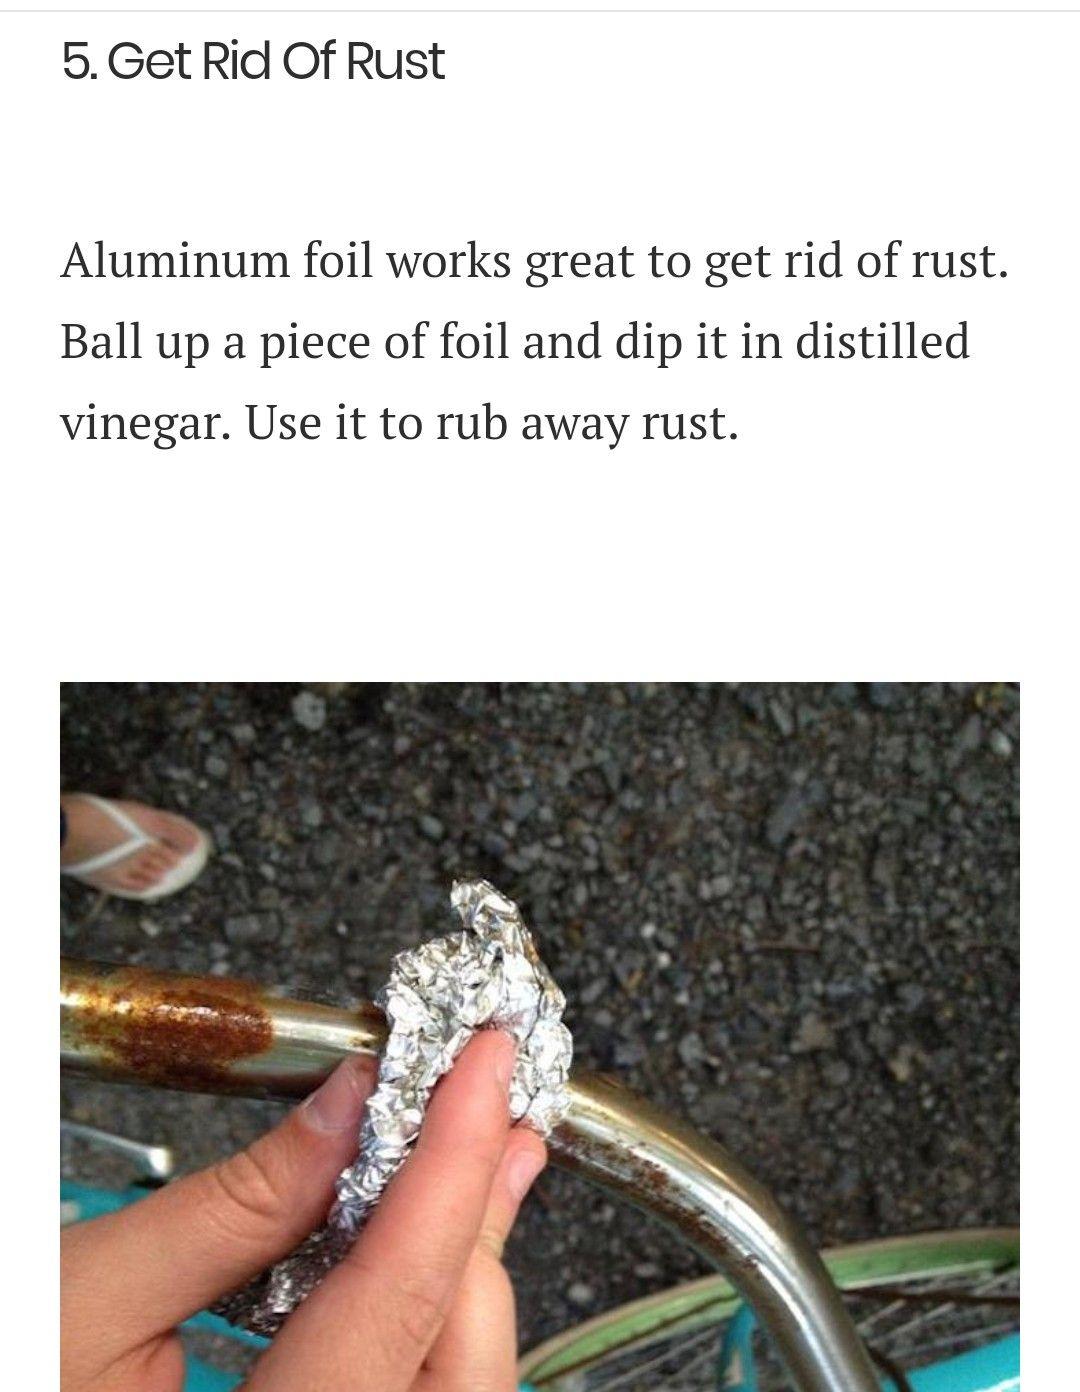 Aluminum Foil Cleans Grill Grates Baking Racks Cast Iron Skillets Add Vinegar To Remove Rust Rusted Cast Iron Skillet Clean Grill Grates Cast Iron Skillet